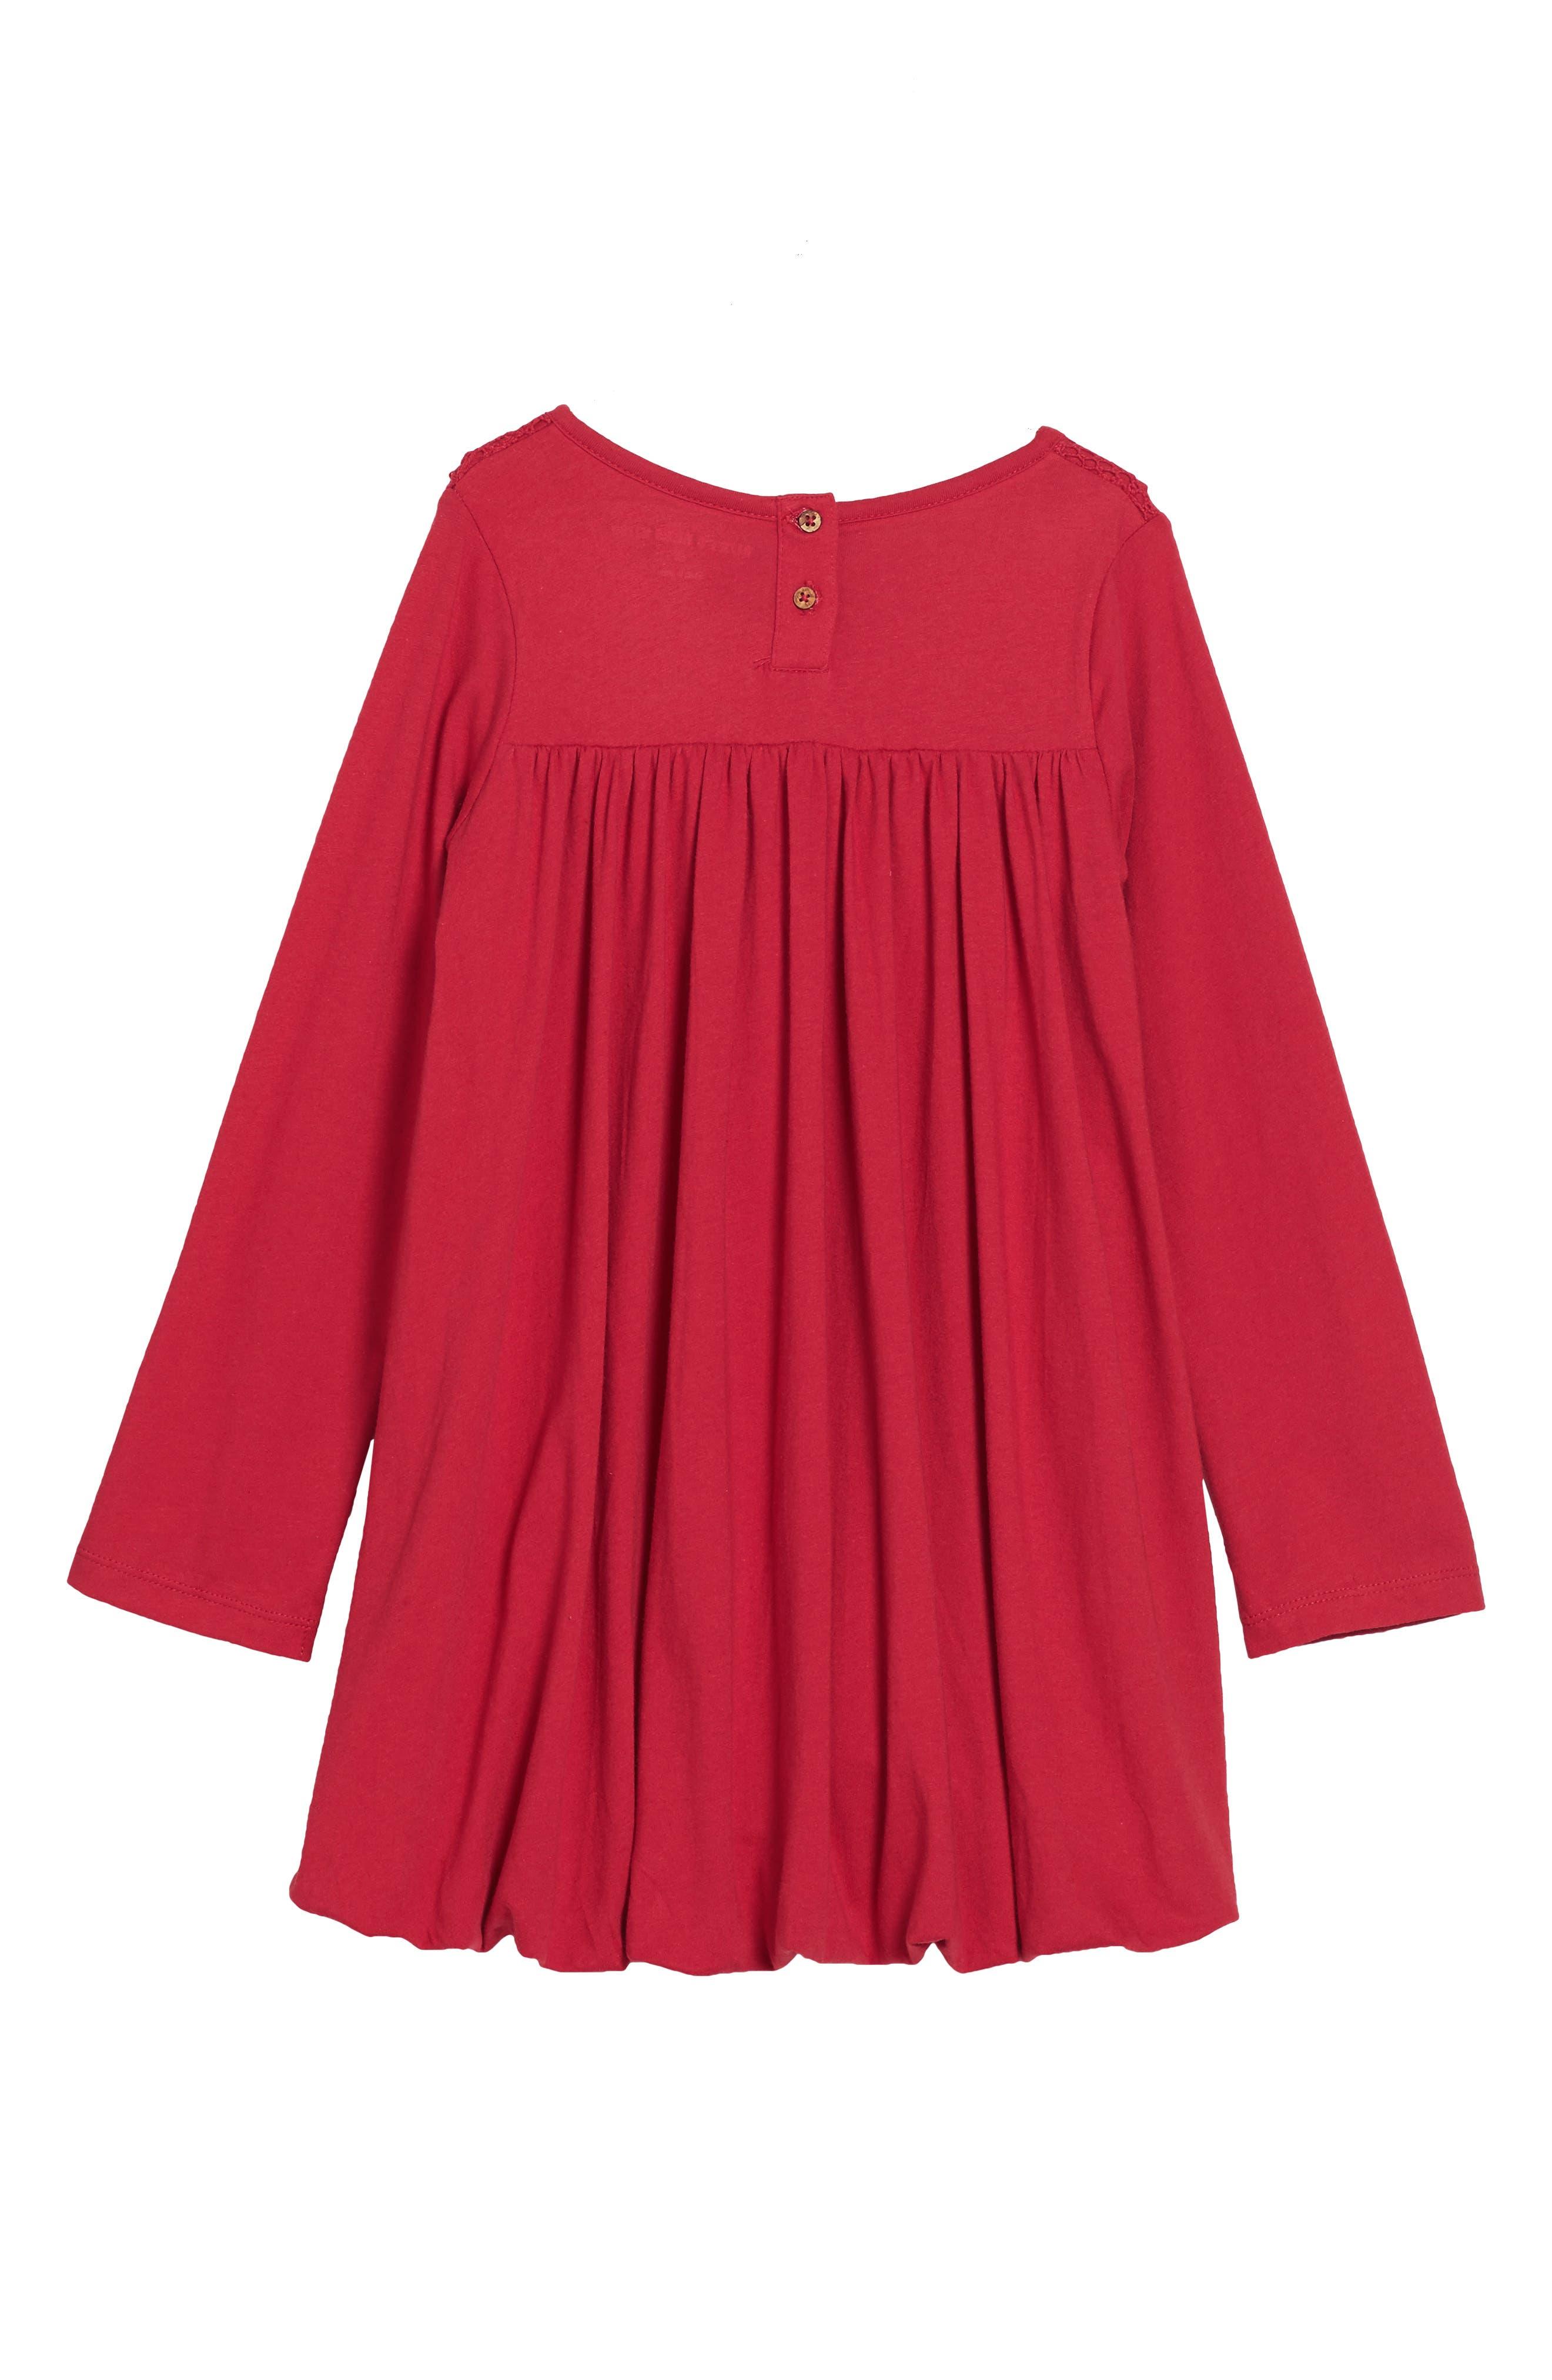 Organic Cotton Bubble Dress,                             Alternate thumbnail 2, color,                             620